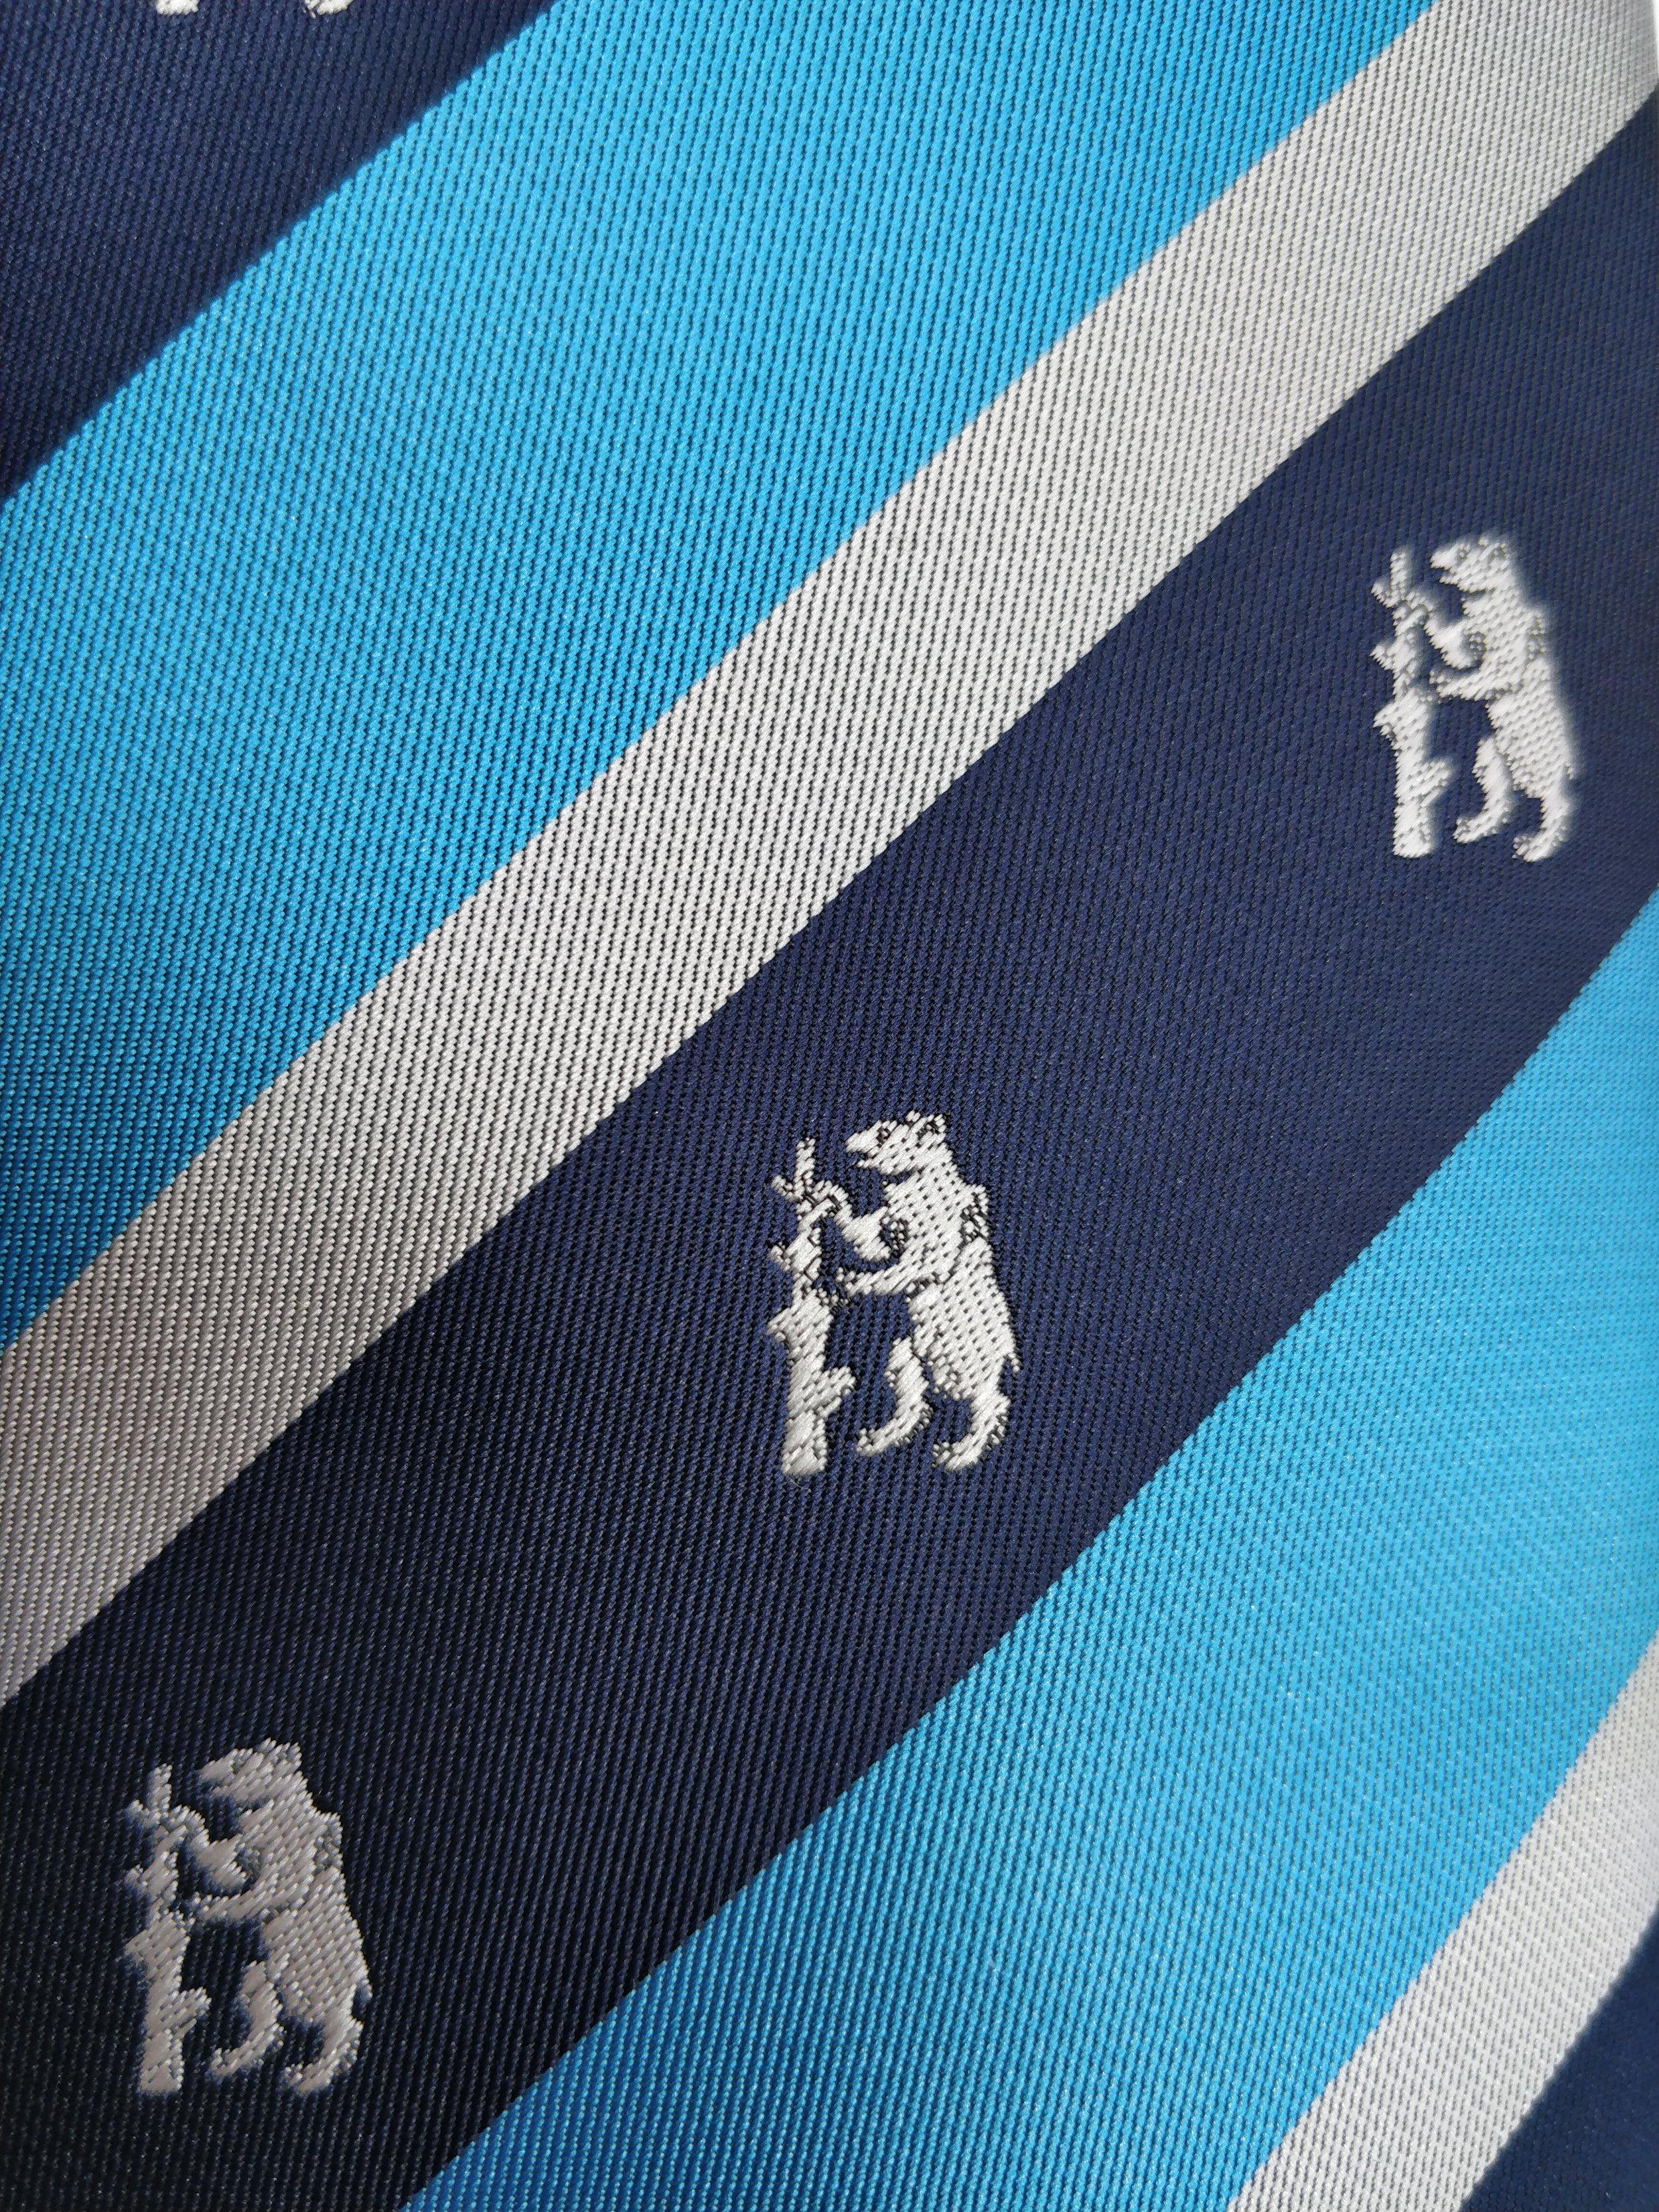 Club Tie Close up.jpg